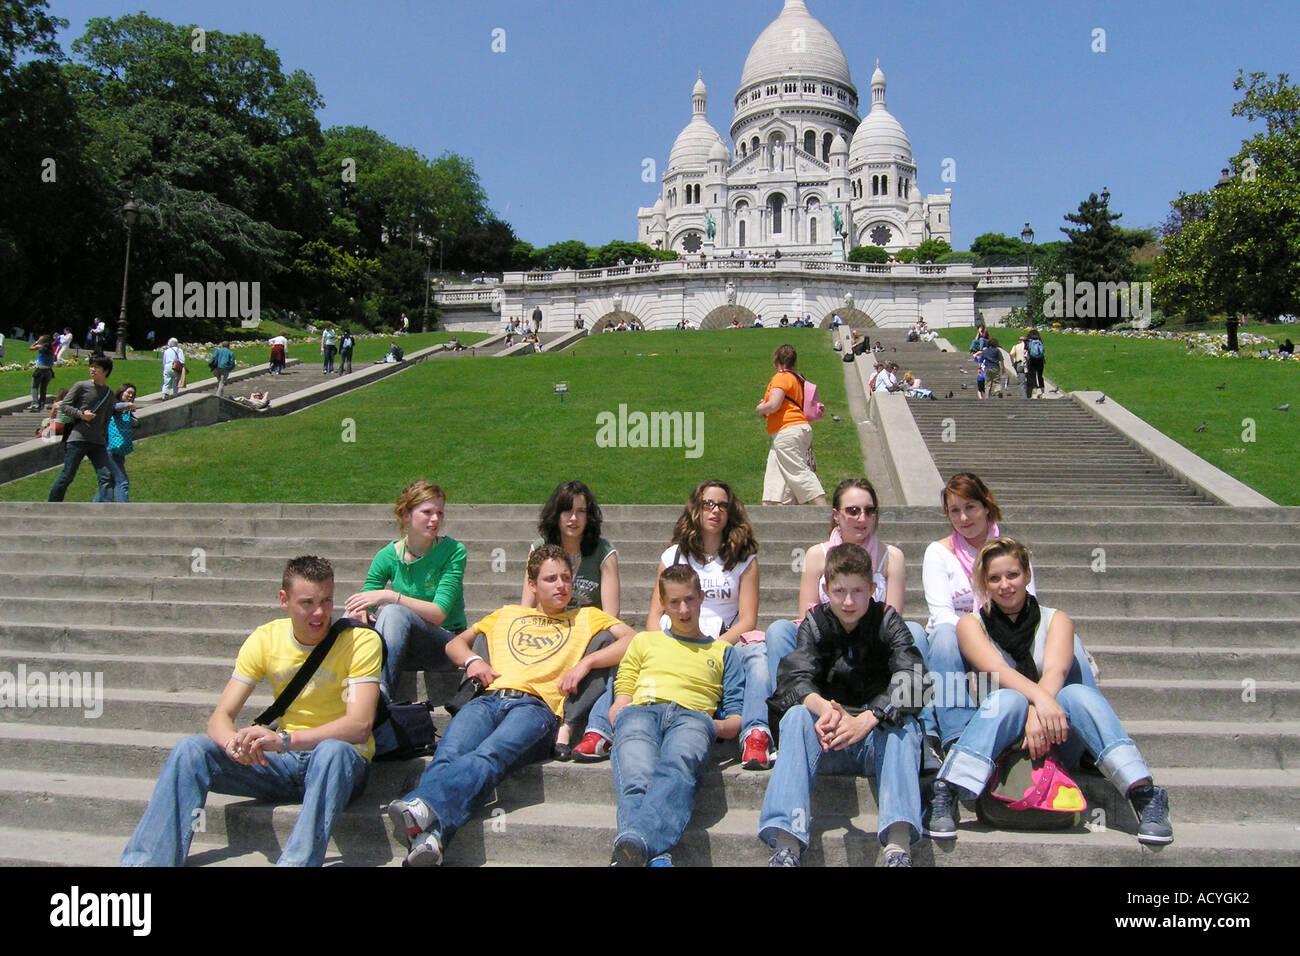 School group of Caucasian teenagers posing for camera in front of Sacre Coeur Paris - Stock Image